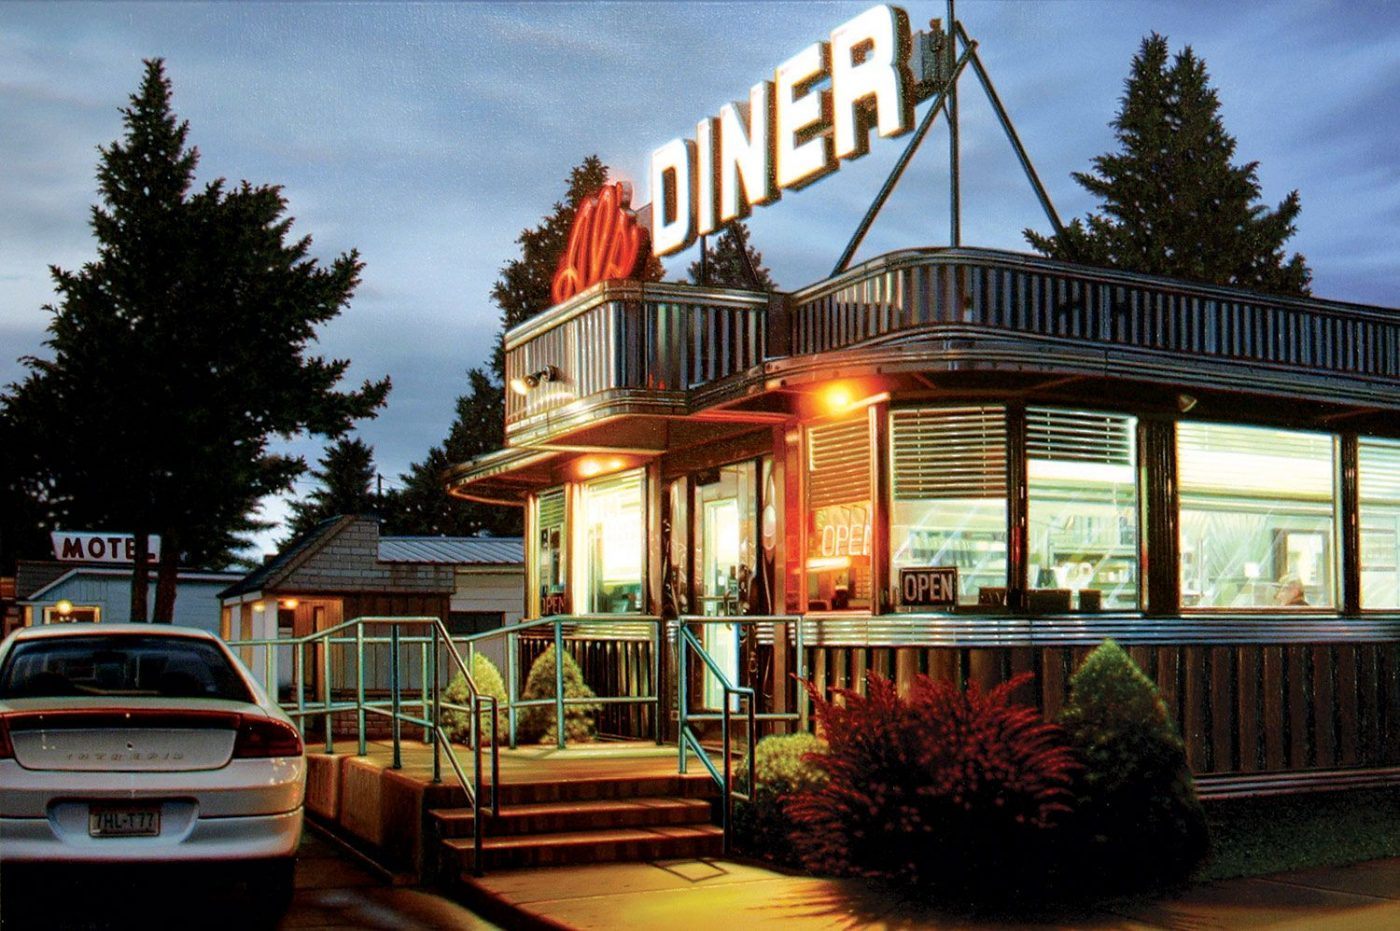 Robert Gniewek, Al's Diner